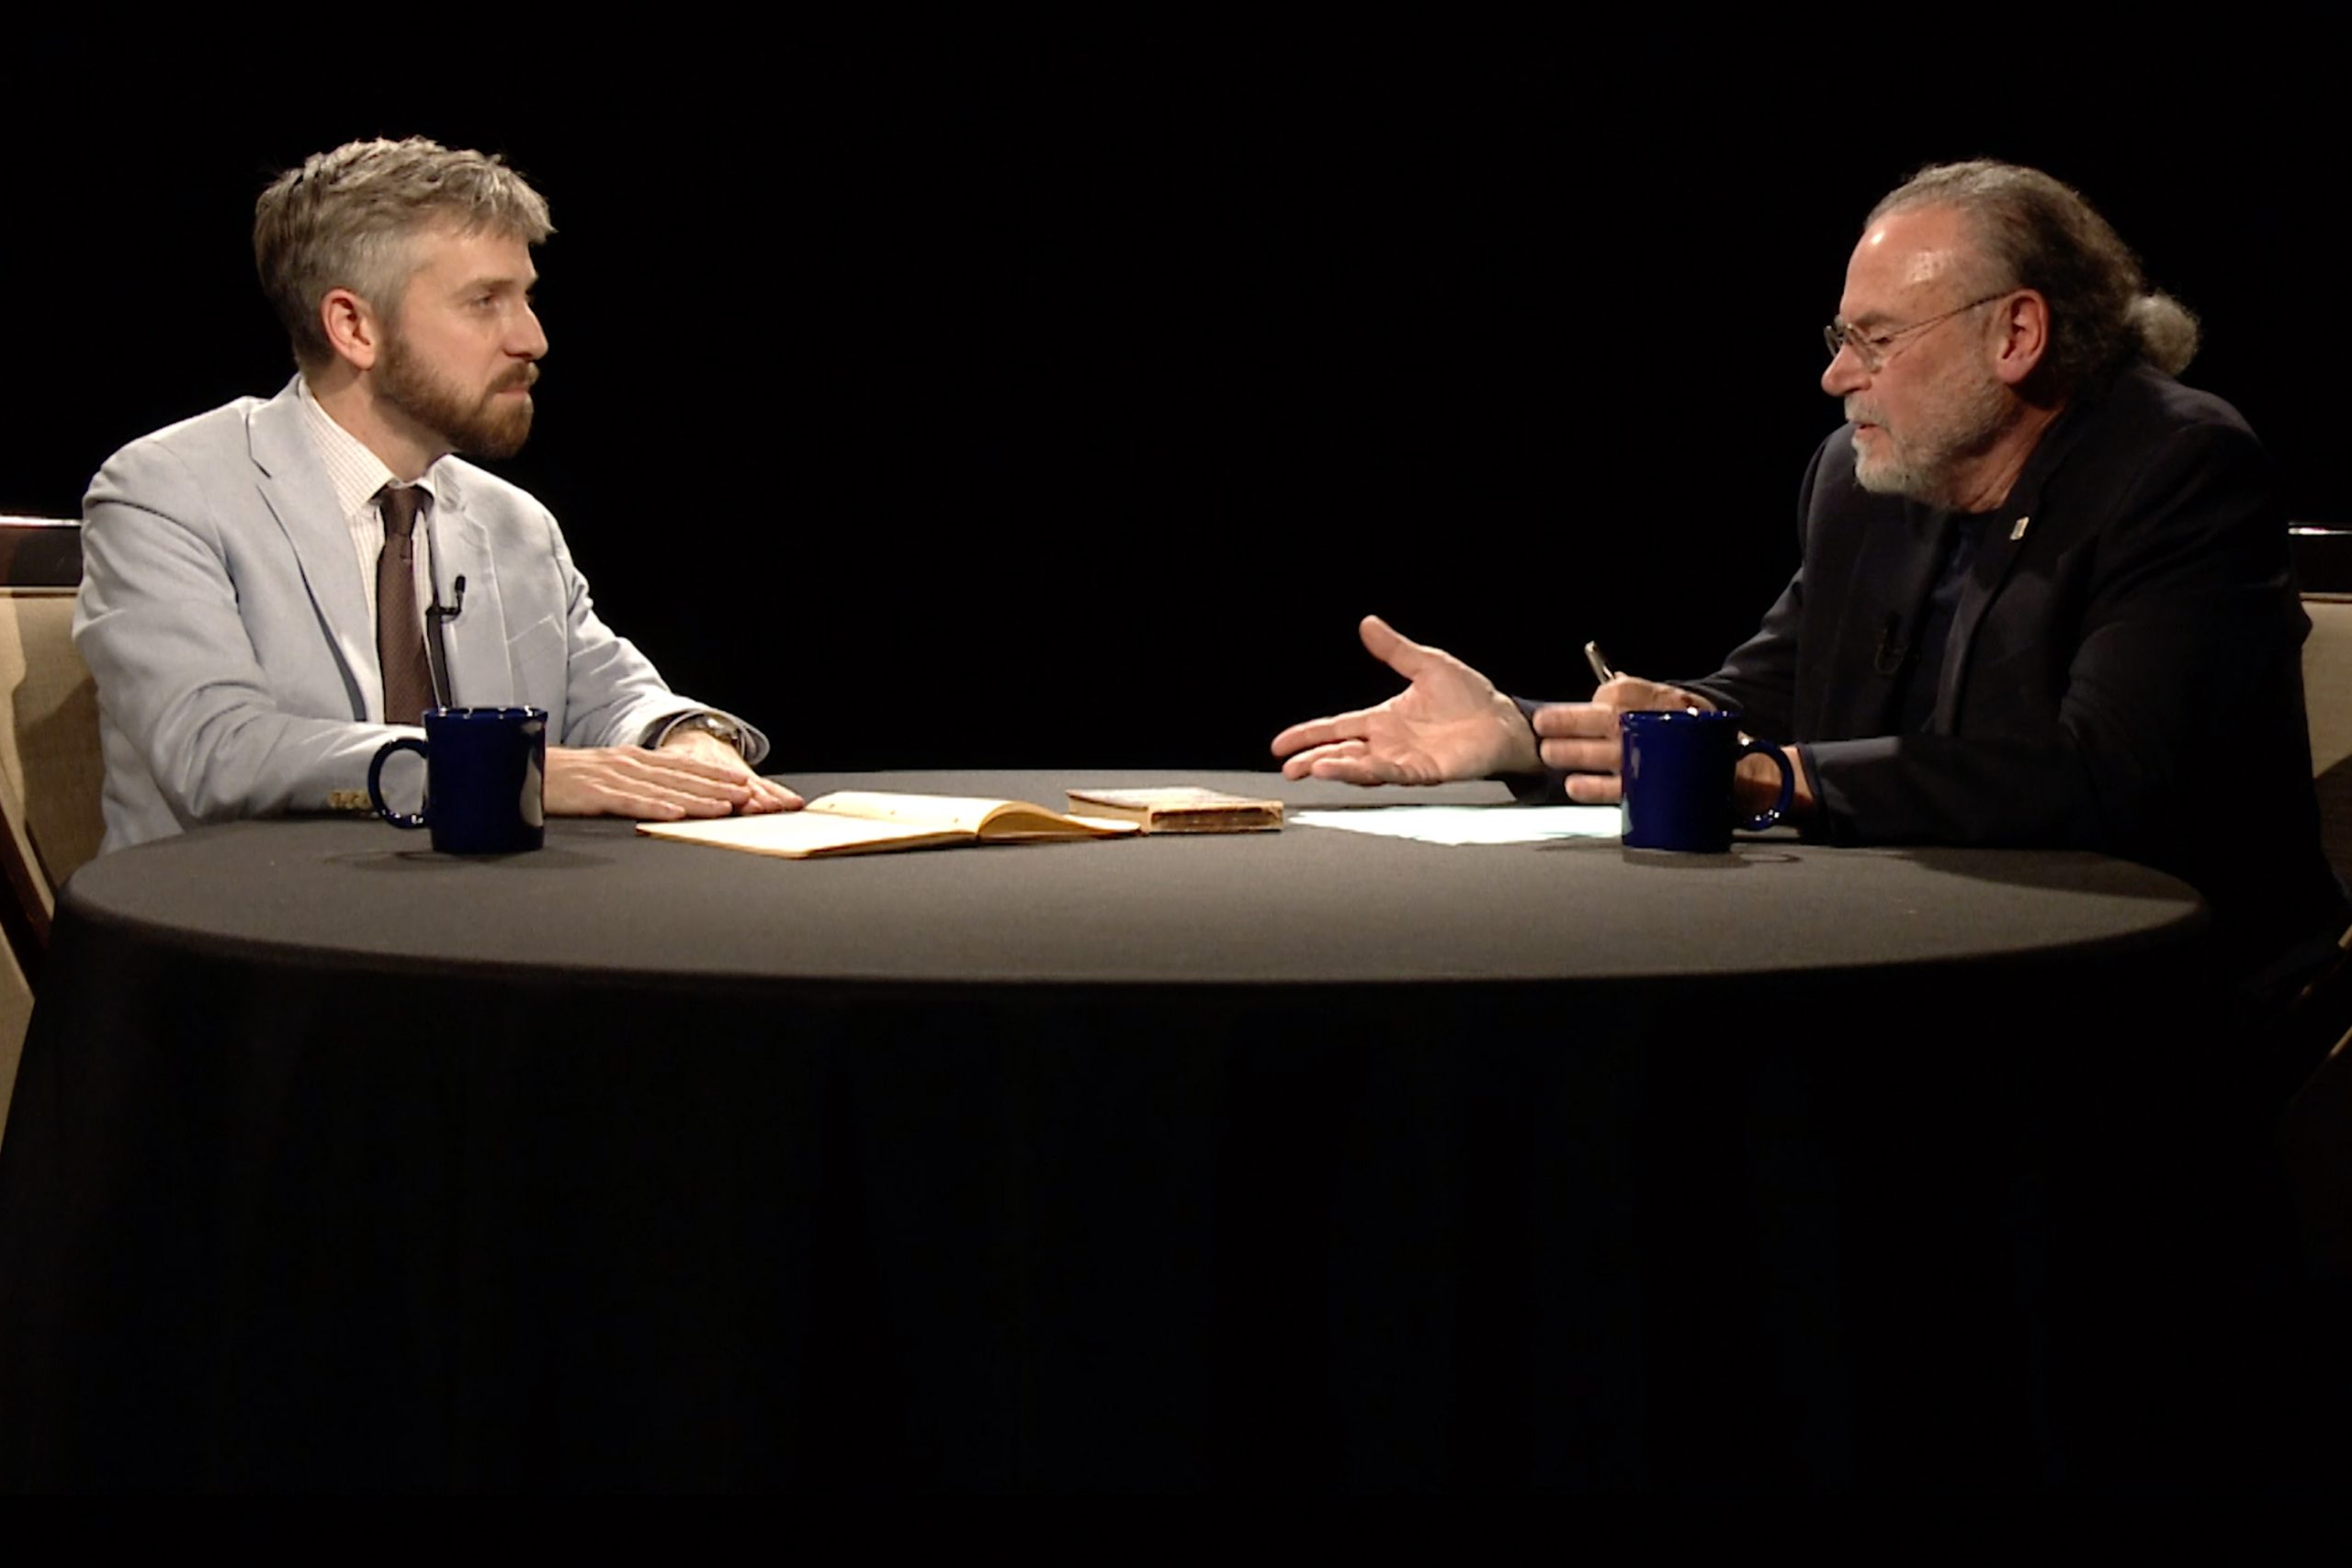 James Osborne talks with Lakeshore PBS host, Thomas J. Roach.